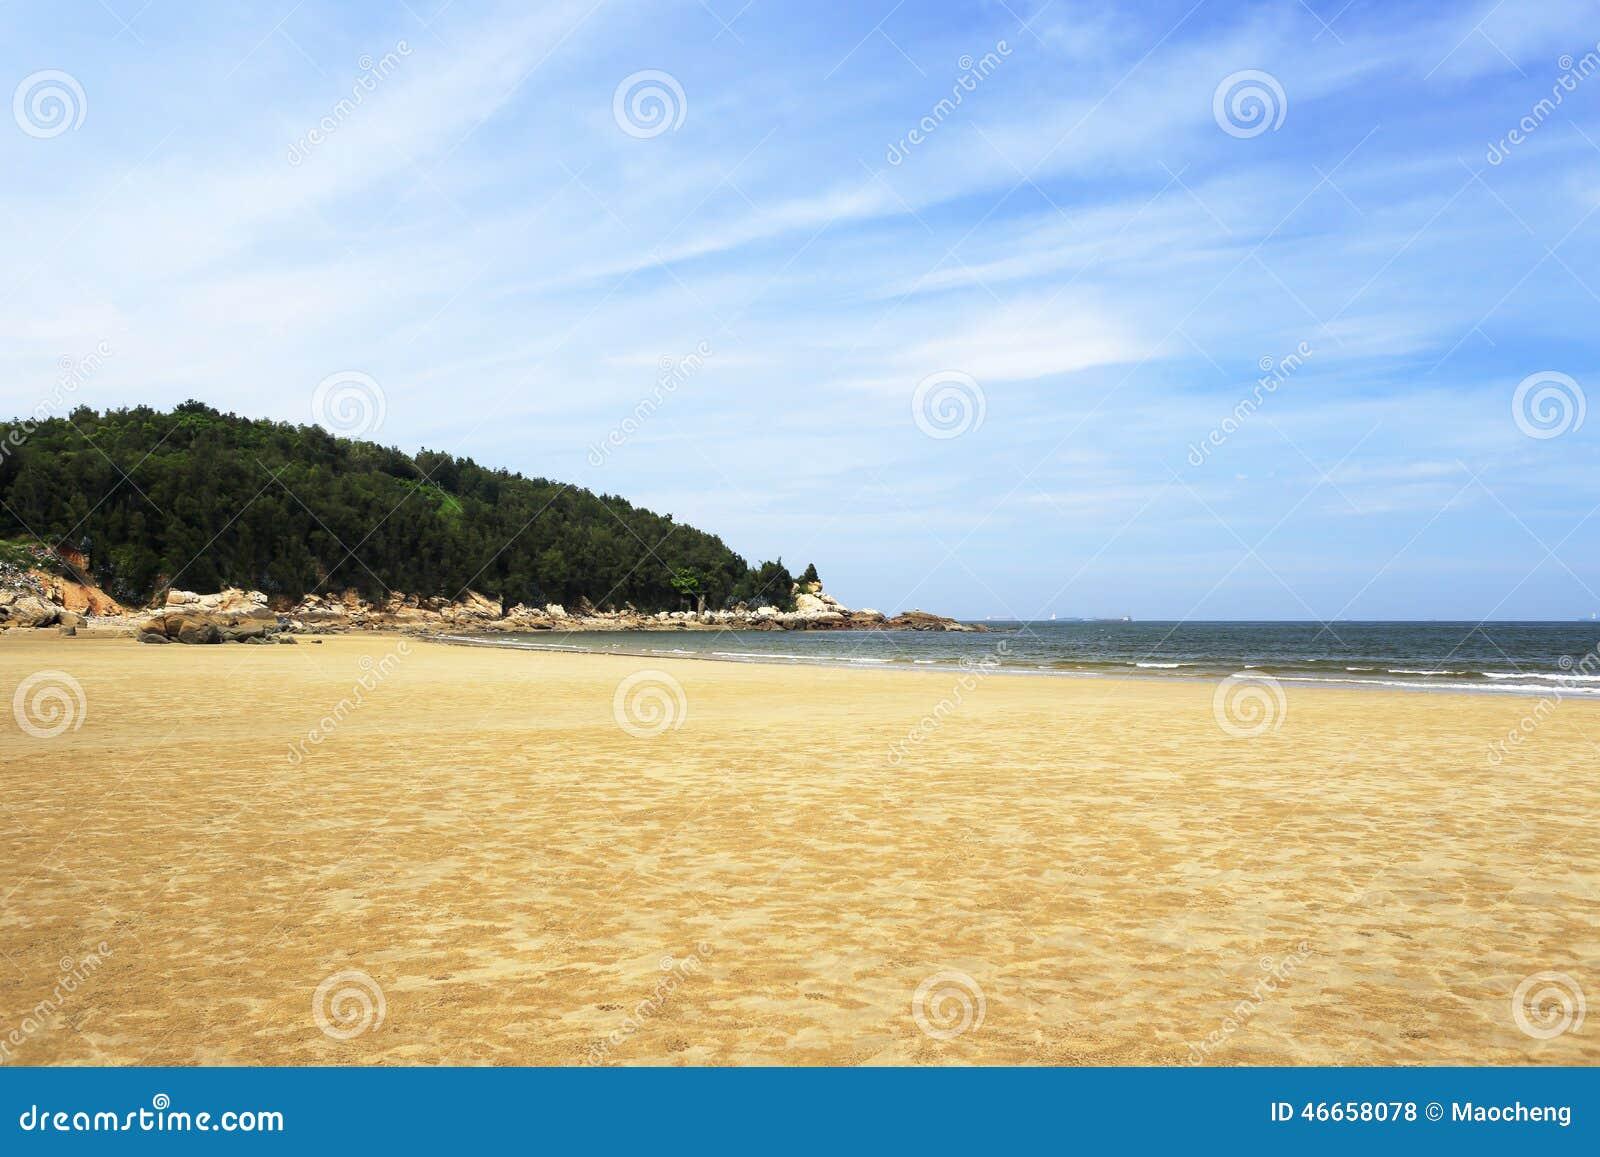 Playa de la arena de la isla de Wuyu